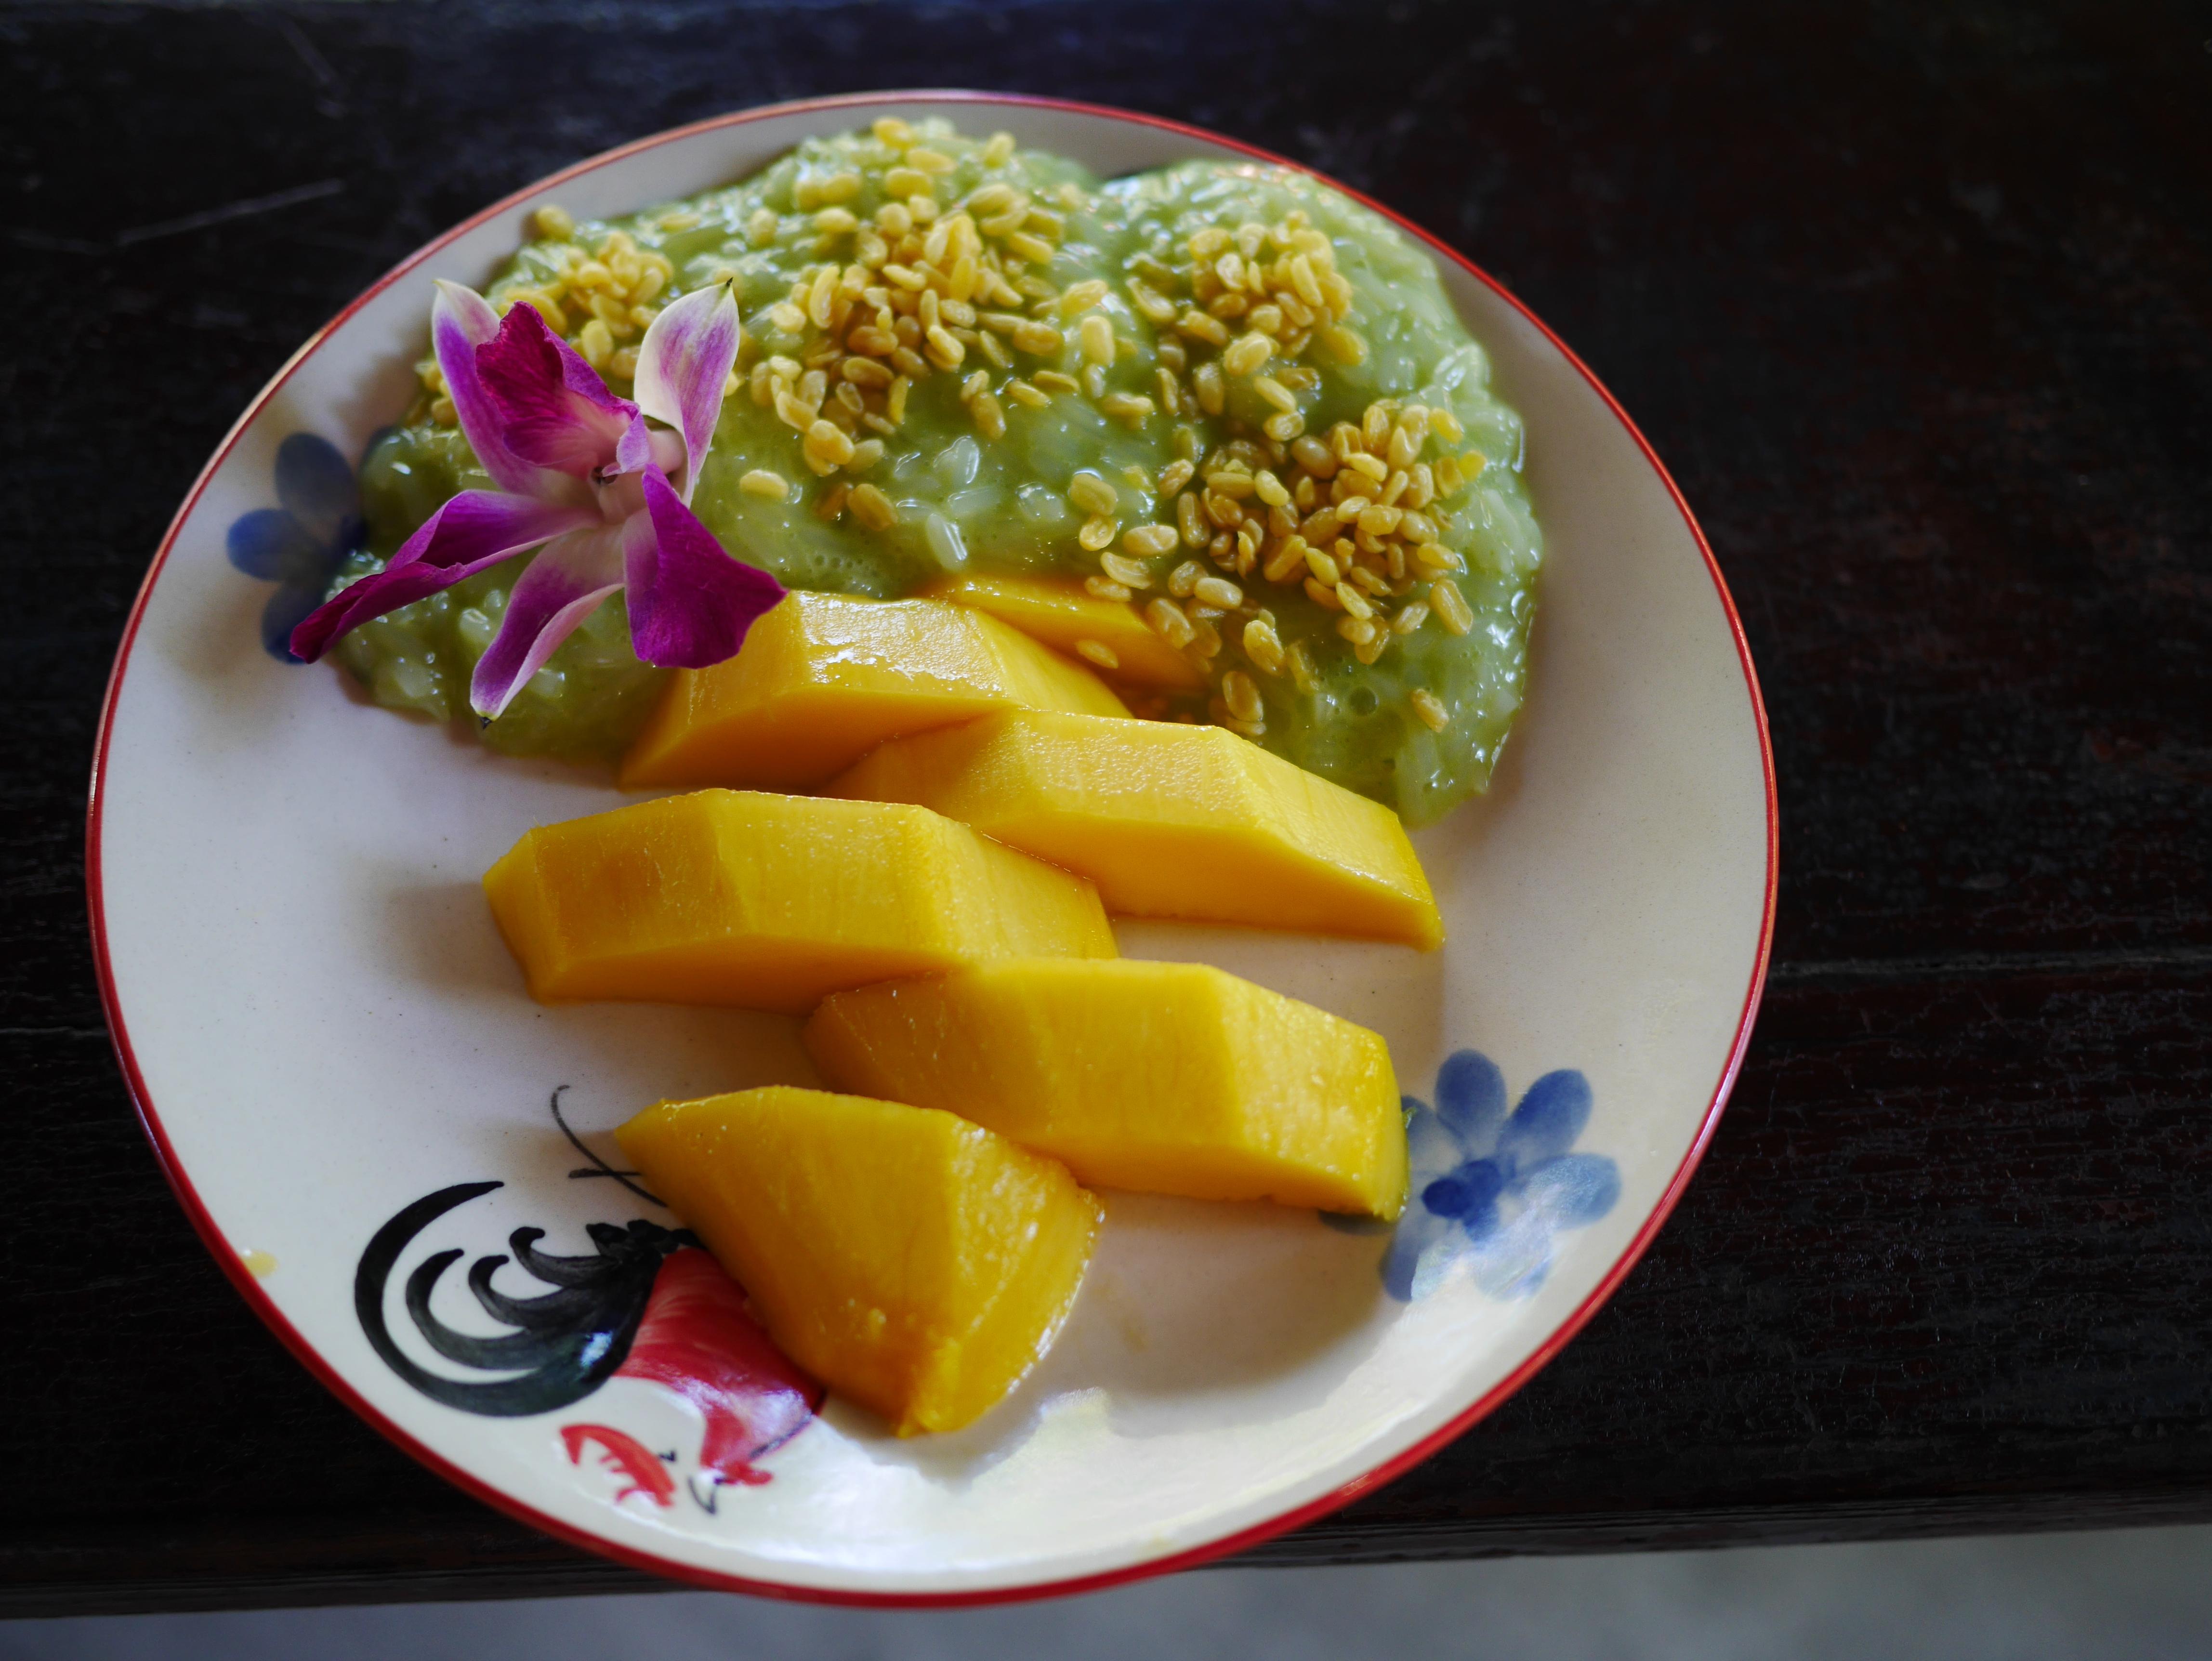 Thai Farm cooking school mango sticky rice Chiang Mai Thailand thesweetwanderlust.com